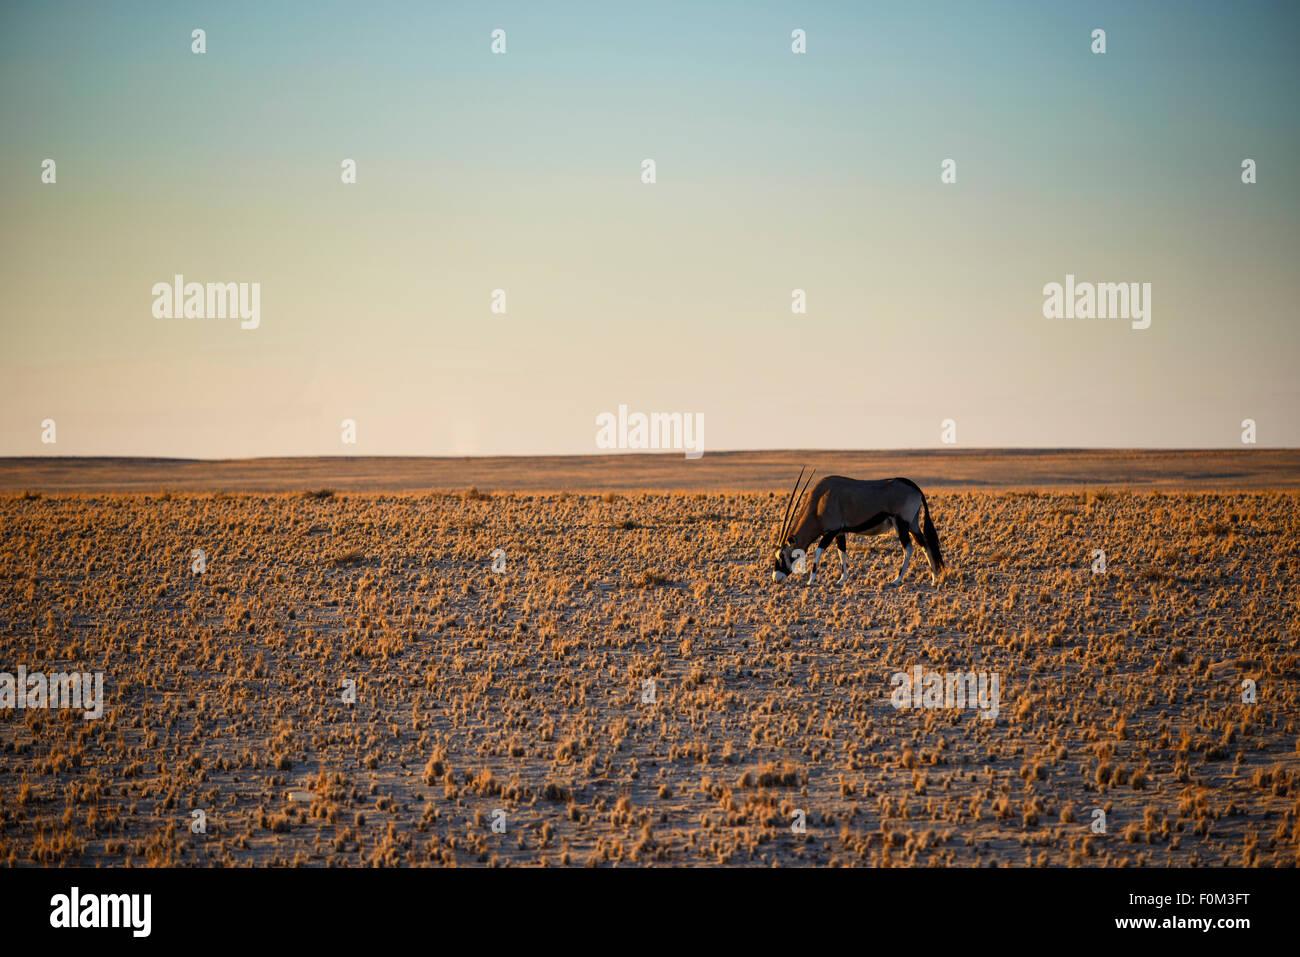 Gemsbok in the Namibian Desert, Namibia - Stock Image